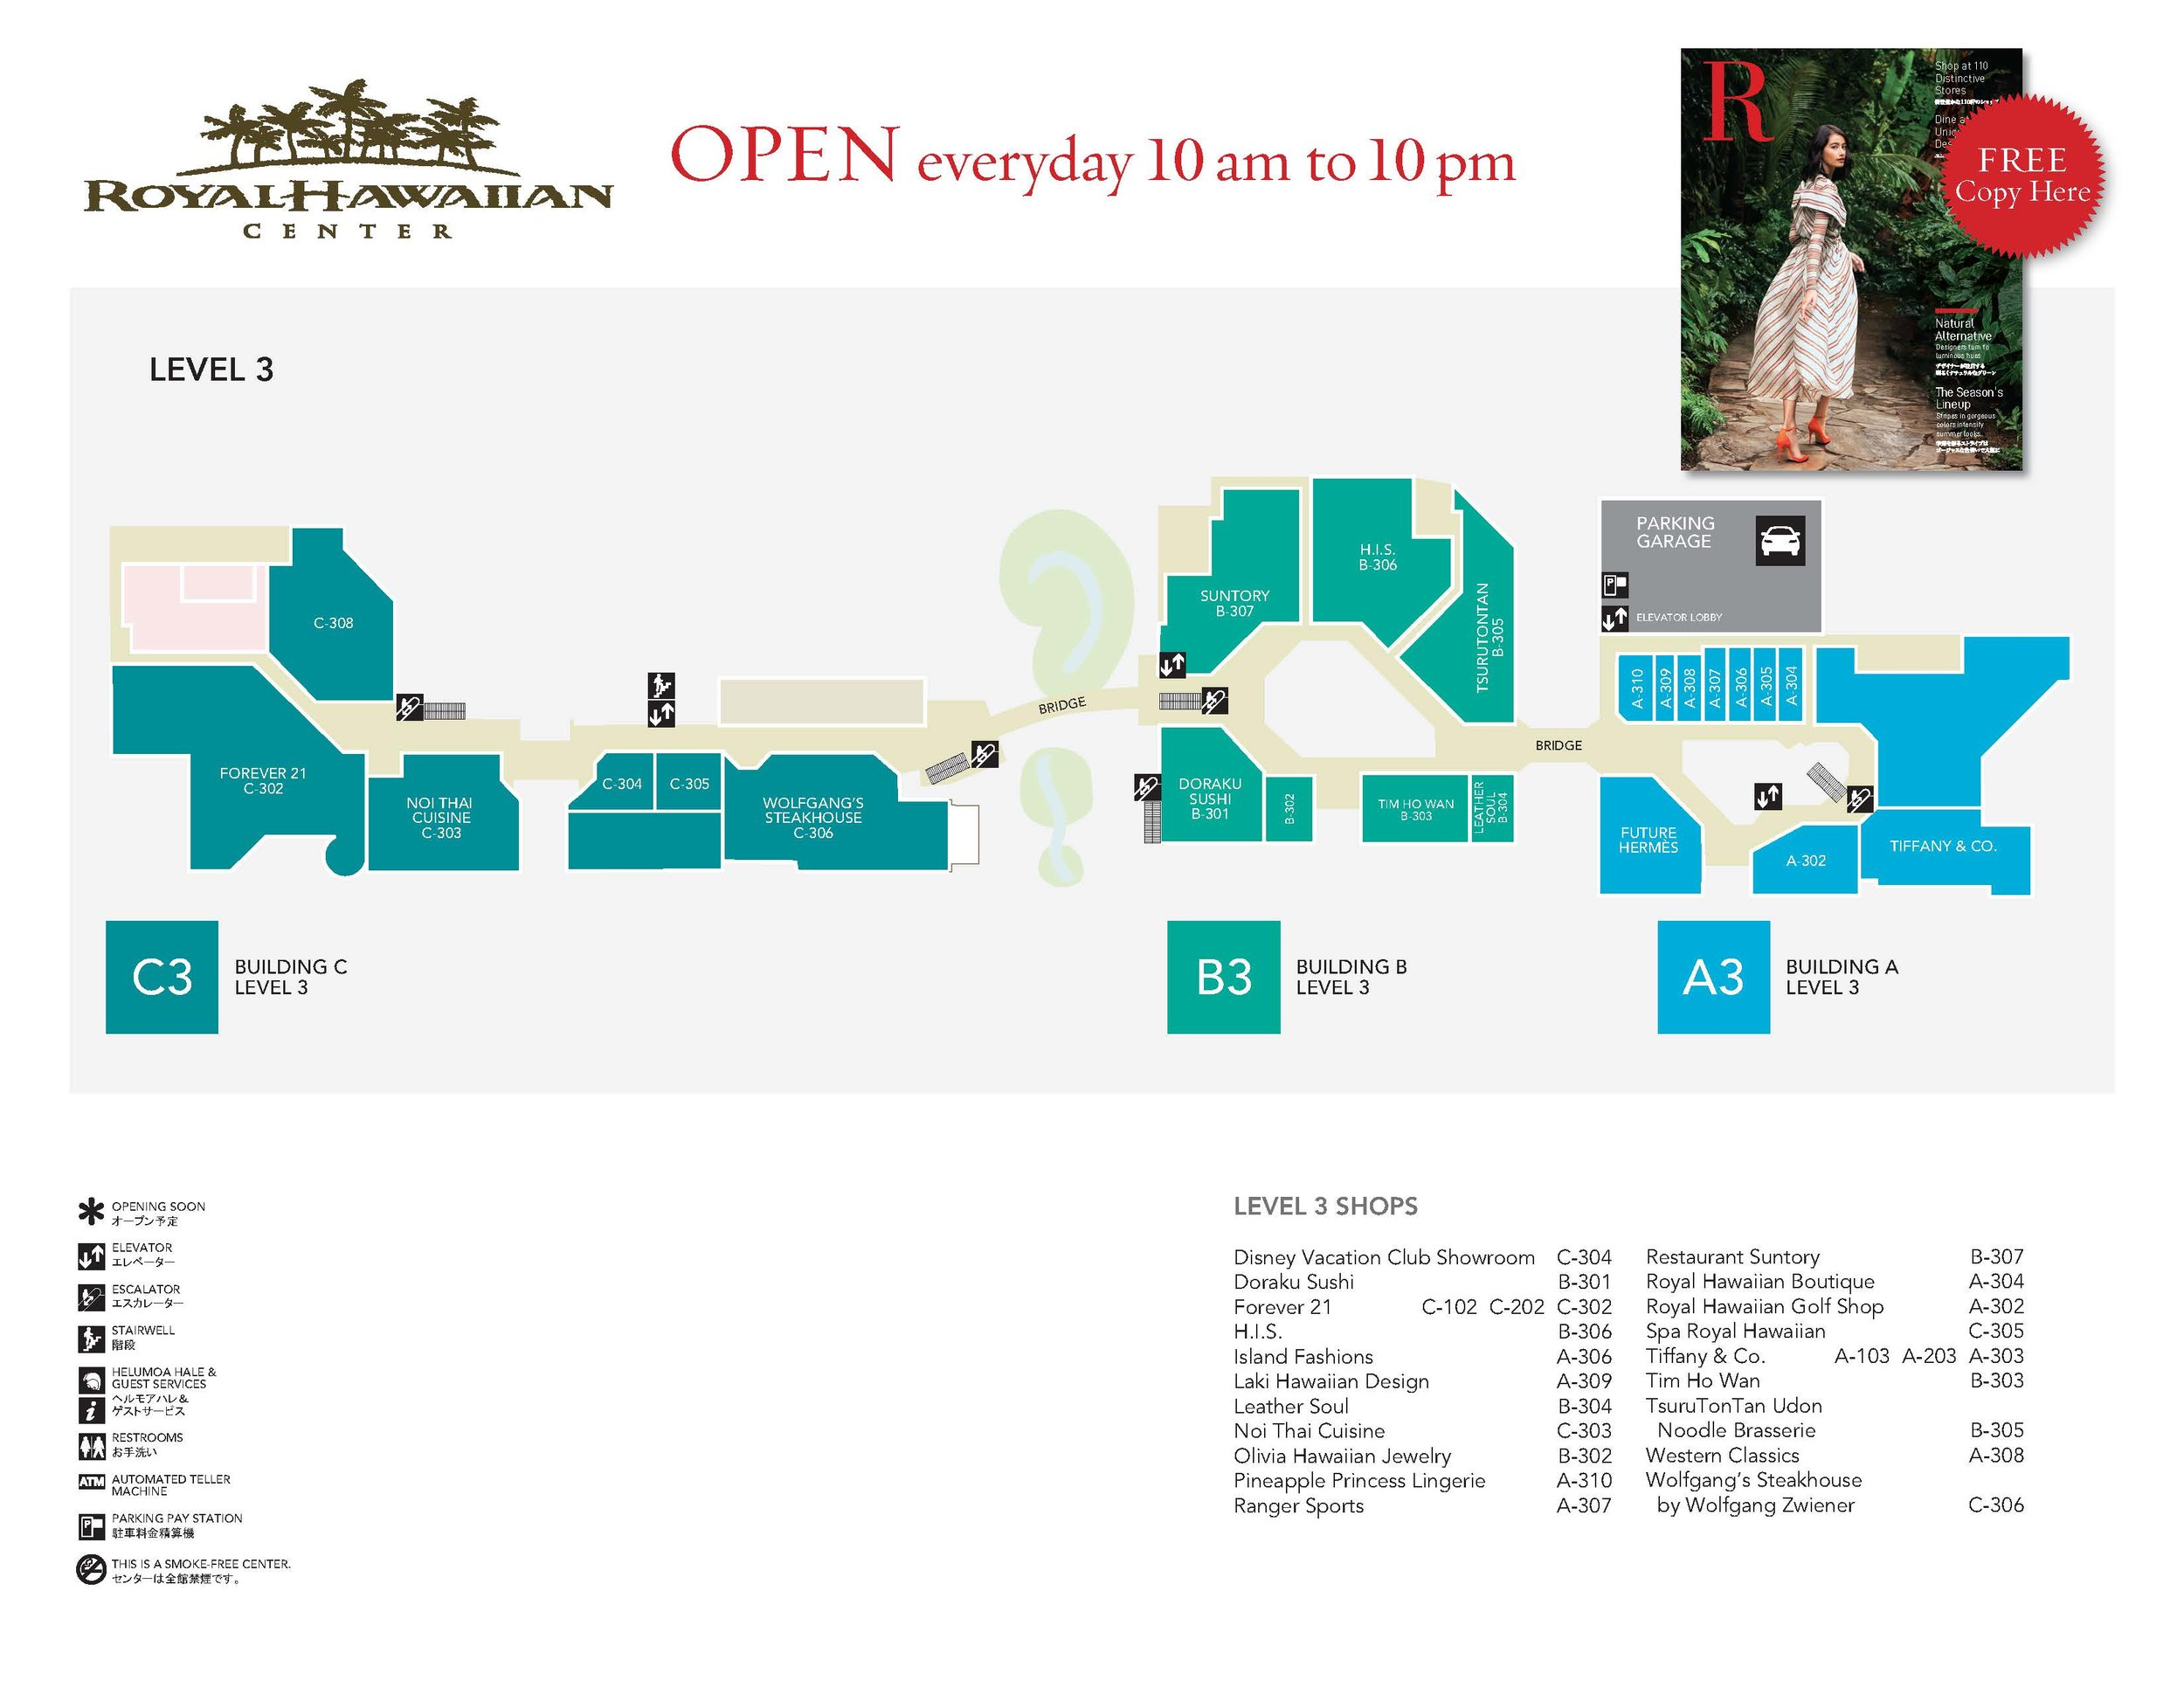 1095-16179-RH-RMag-Maps-May18-FINAL_Page_3.jpg